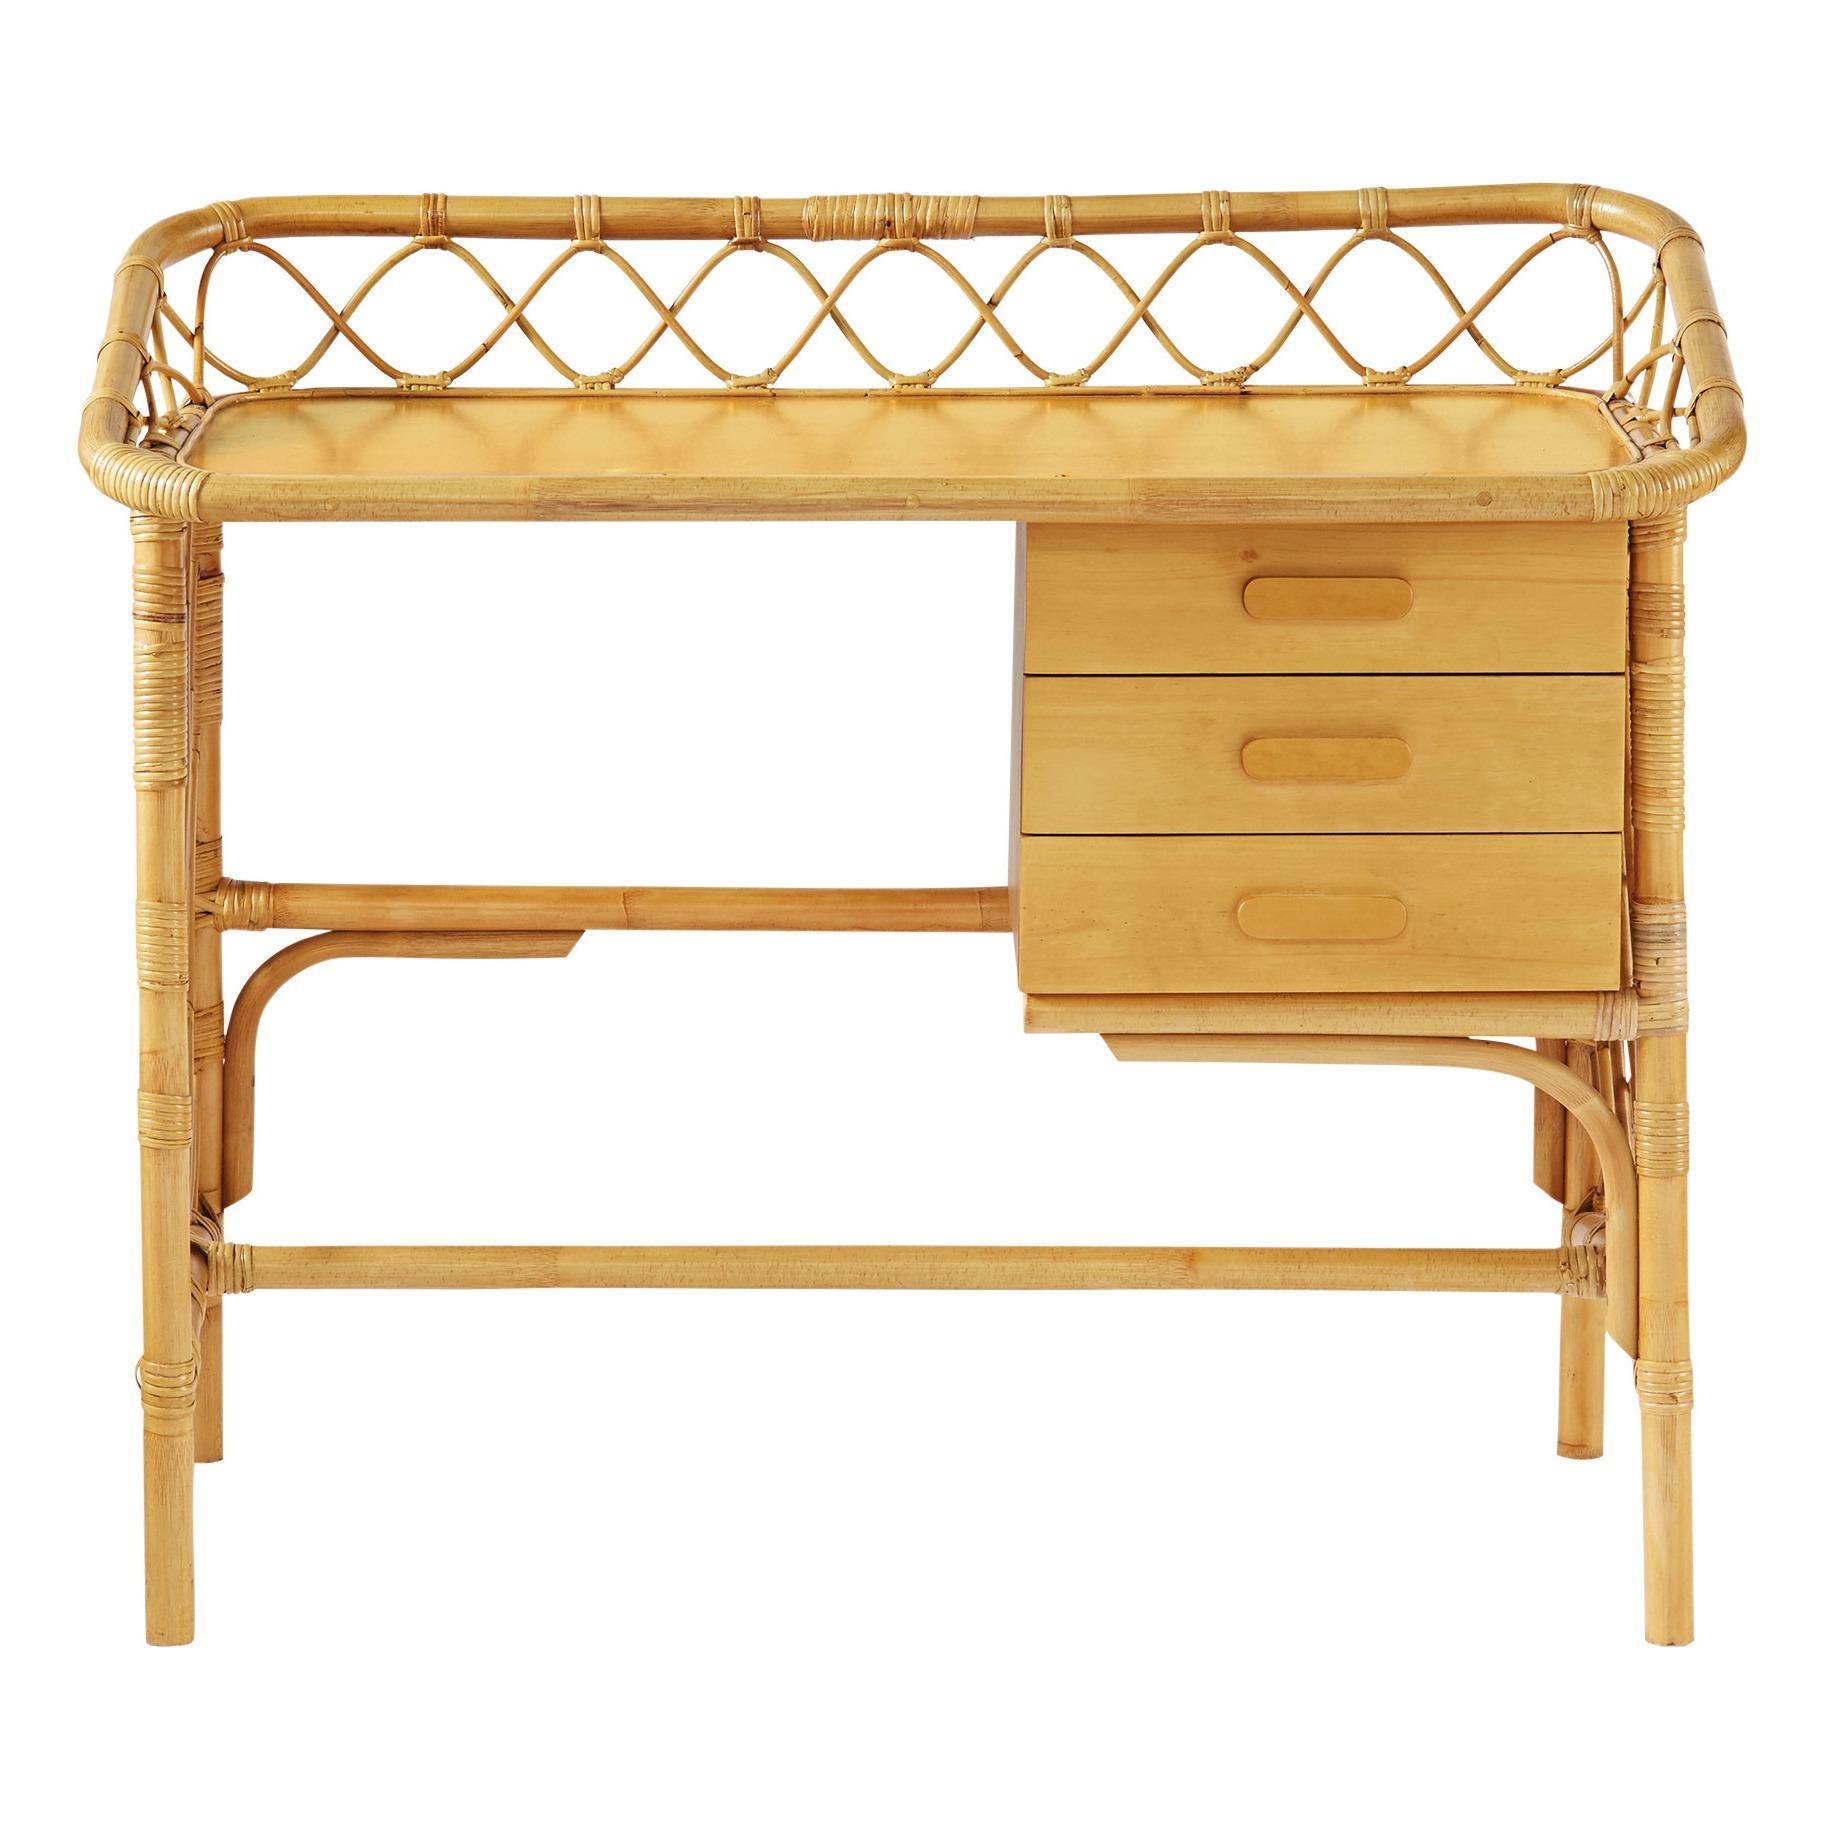 bonton-bureau-boheme-rotin-vintage-chambre-enfant